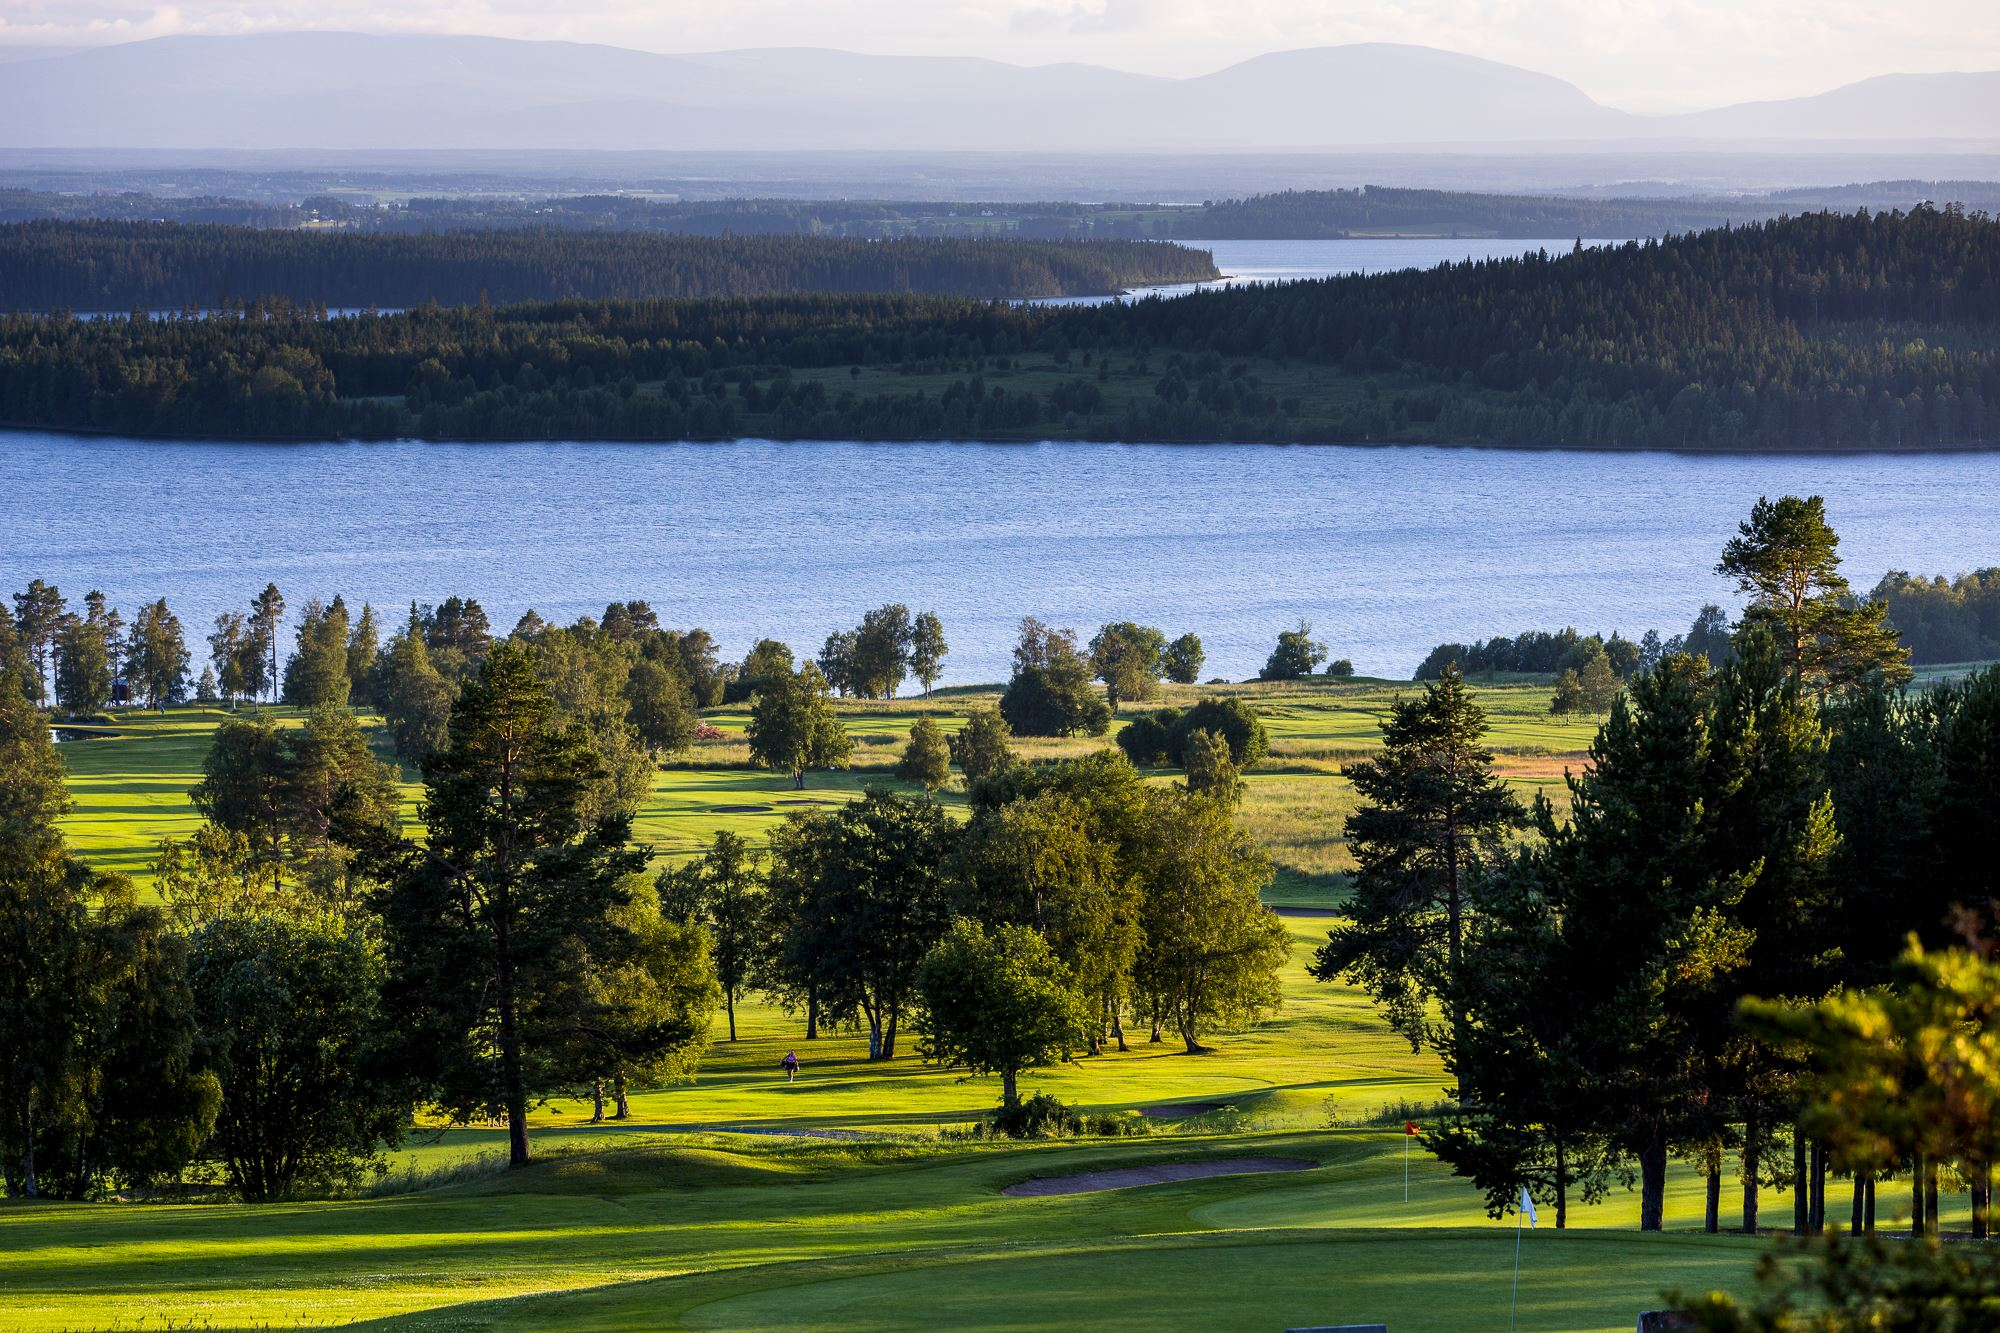 Foto: Golfkrogen Frösön,  © Copy: Visit Östersund, GolfKrogen Frösön